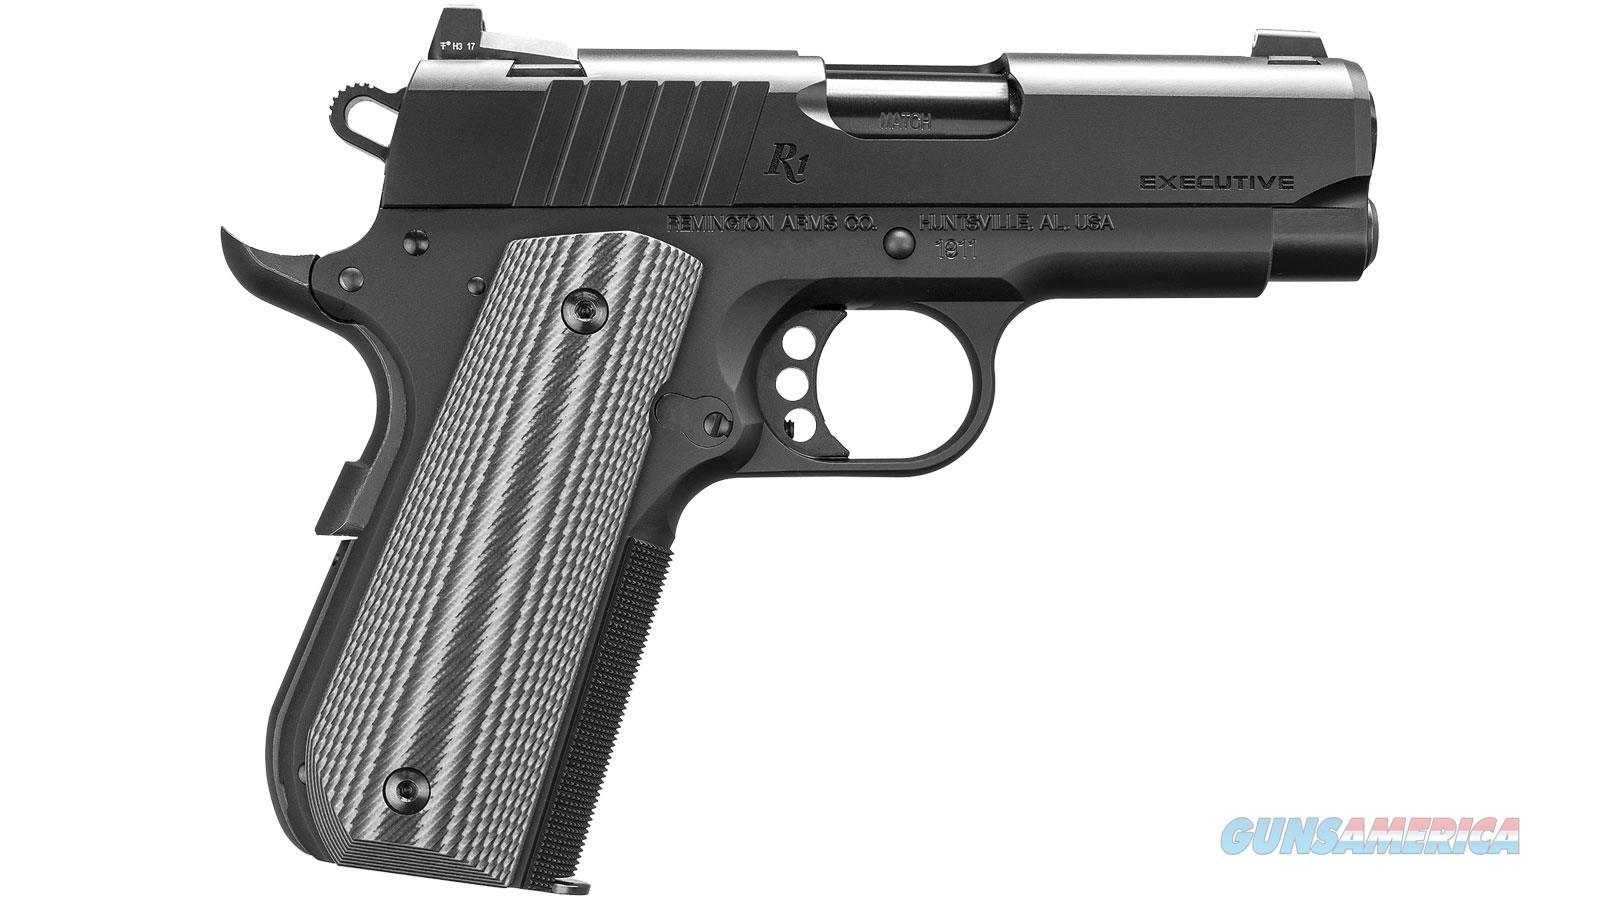 Remington 1911 R1 45Acp 7+1 Ultralight Excu 3.5 96493  Guns > Pistols > R Misc Pistols